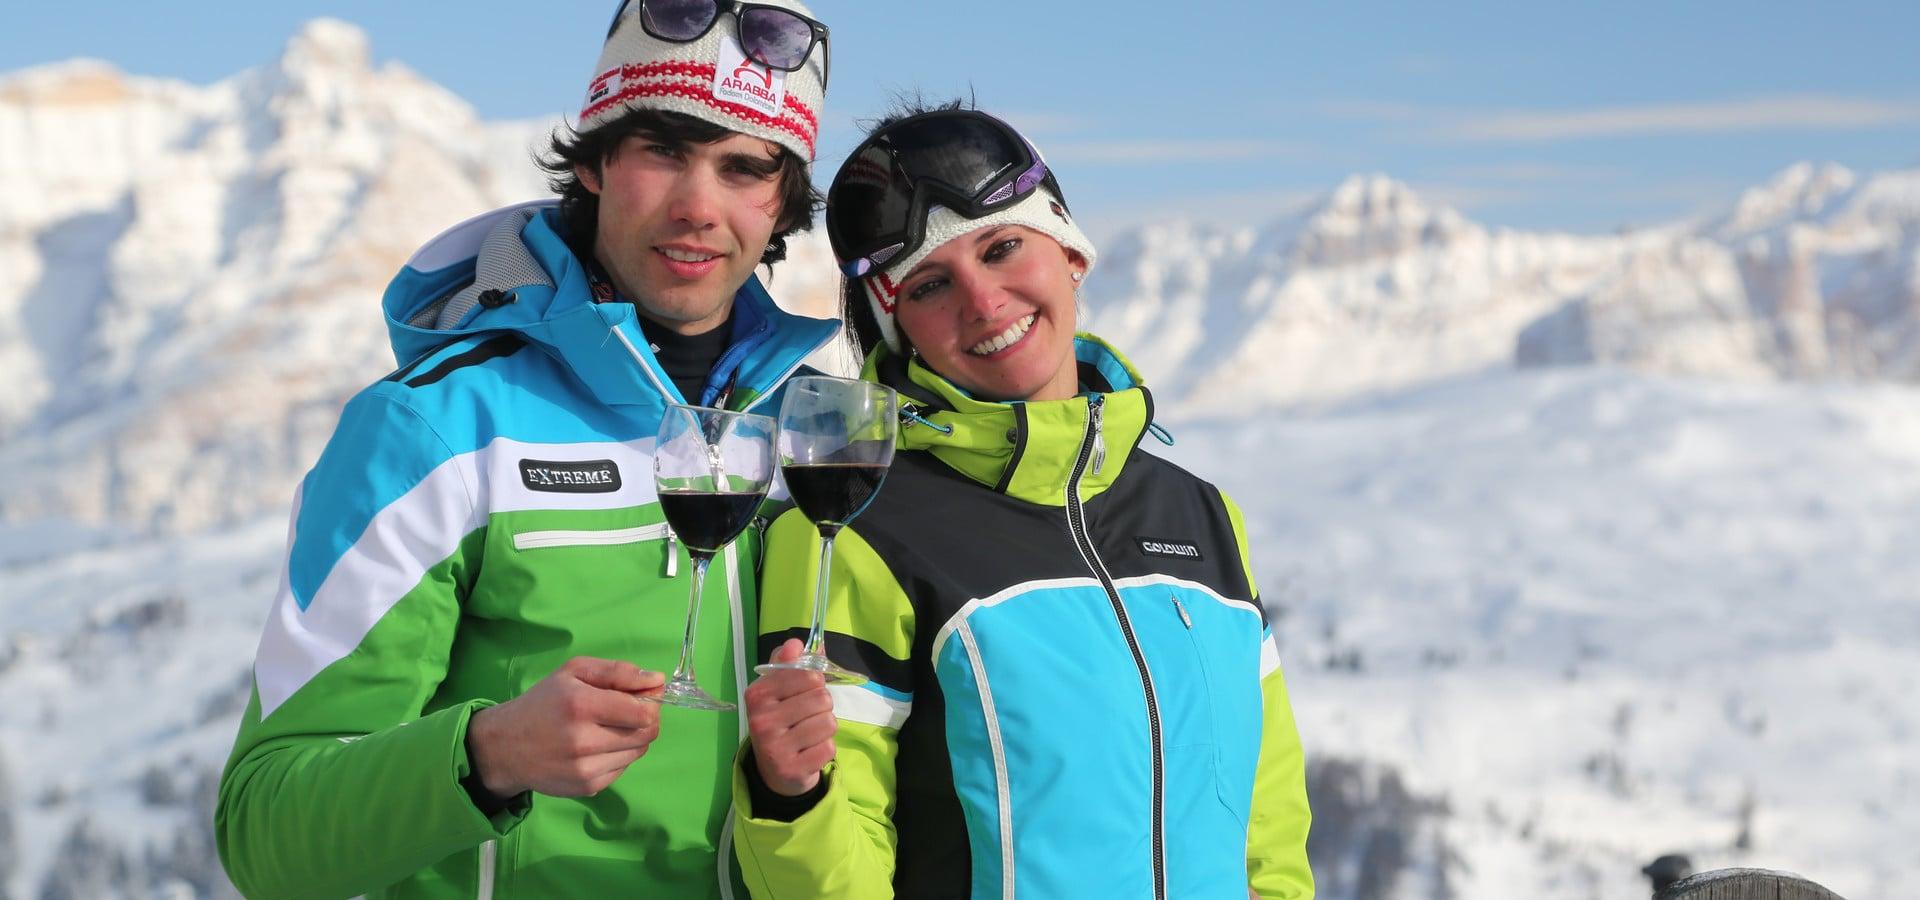 08.04.17 Ski & Wine Arabba - Marmolada